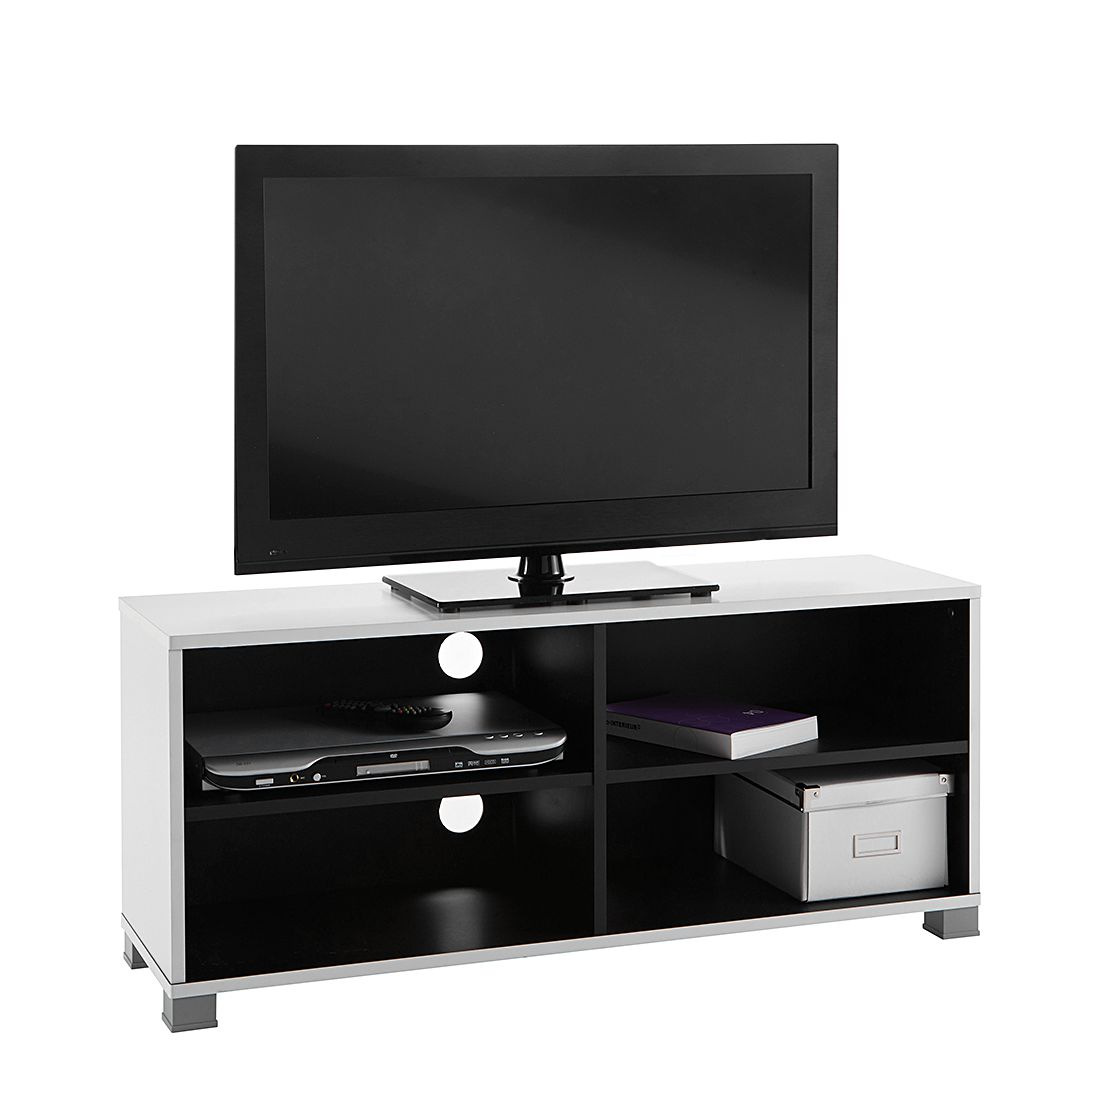 Scrapeo meuble tv noir blanc for Meuble tv jeffrey